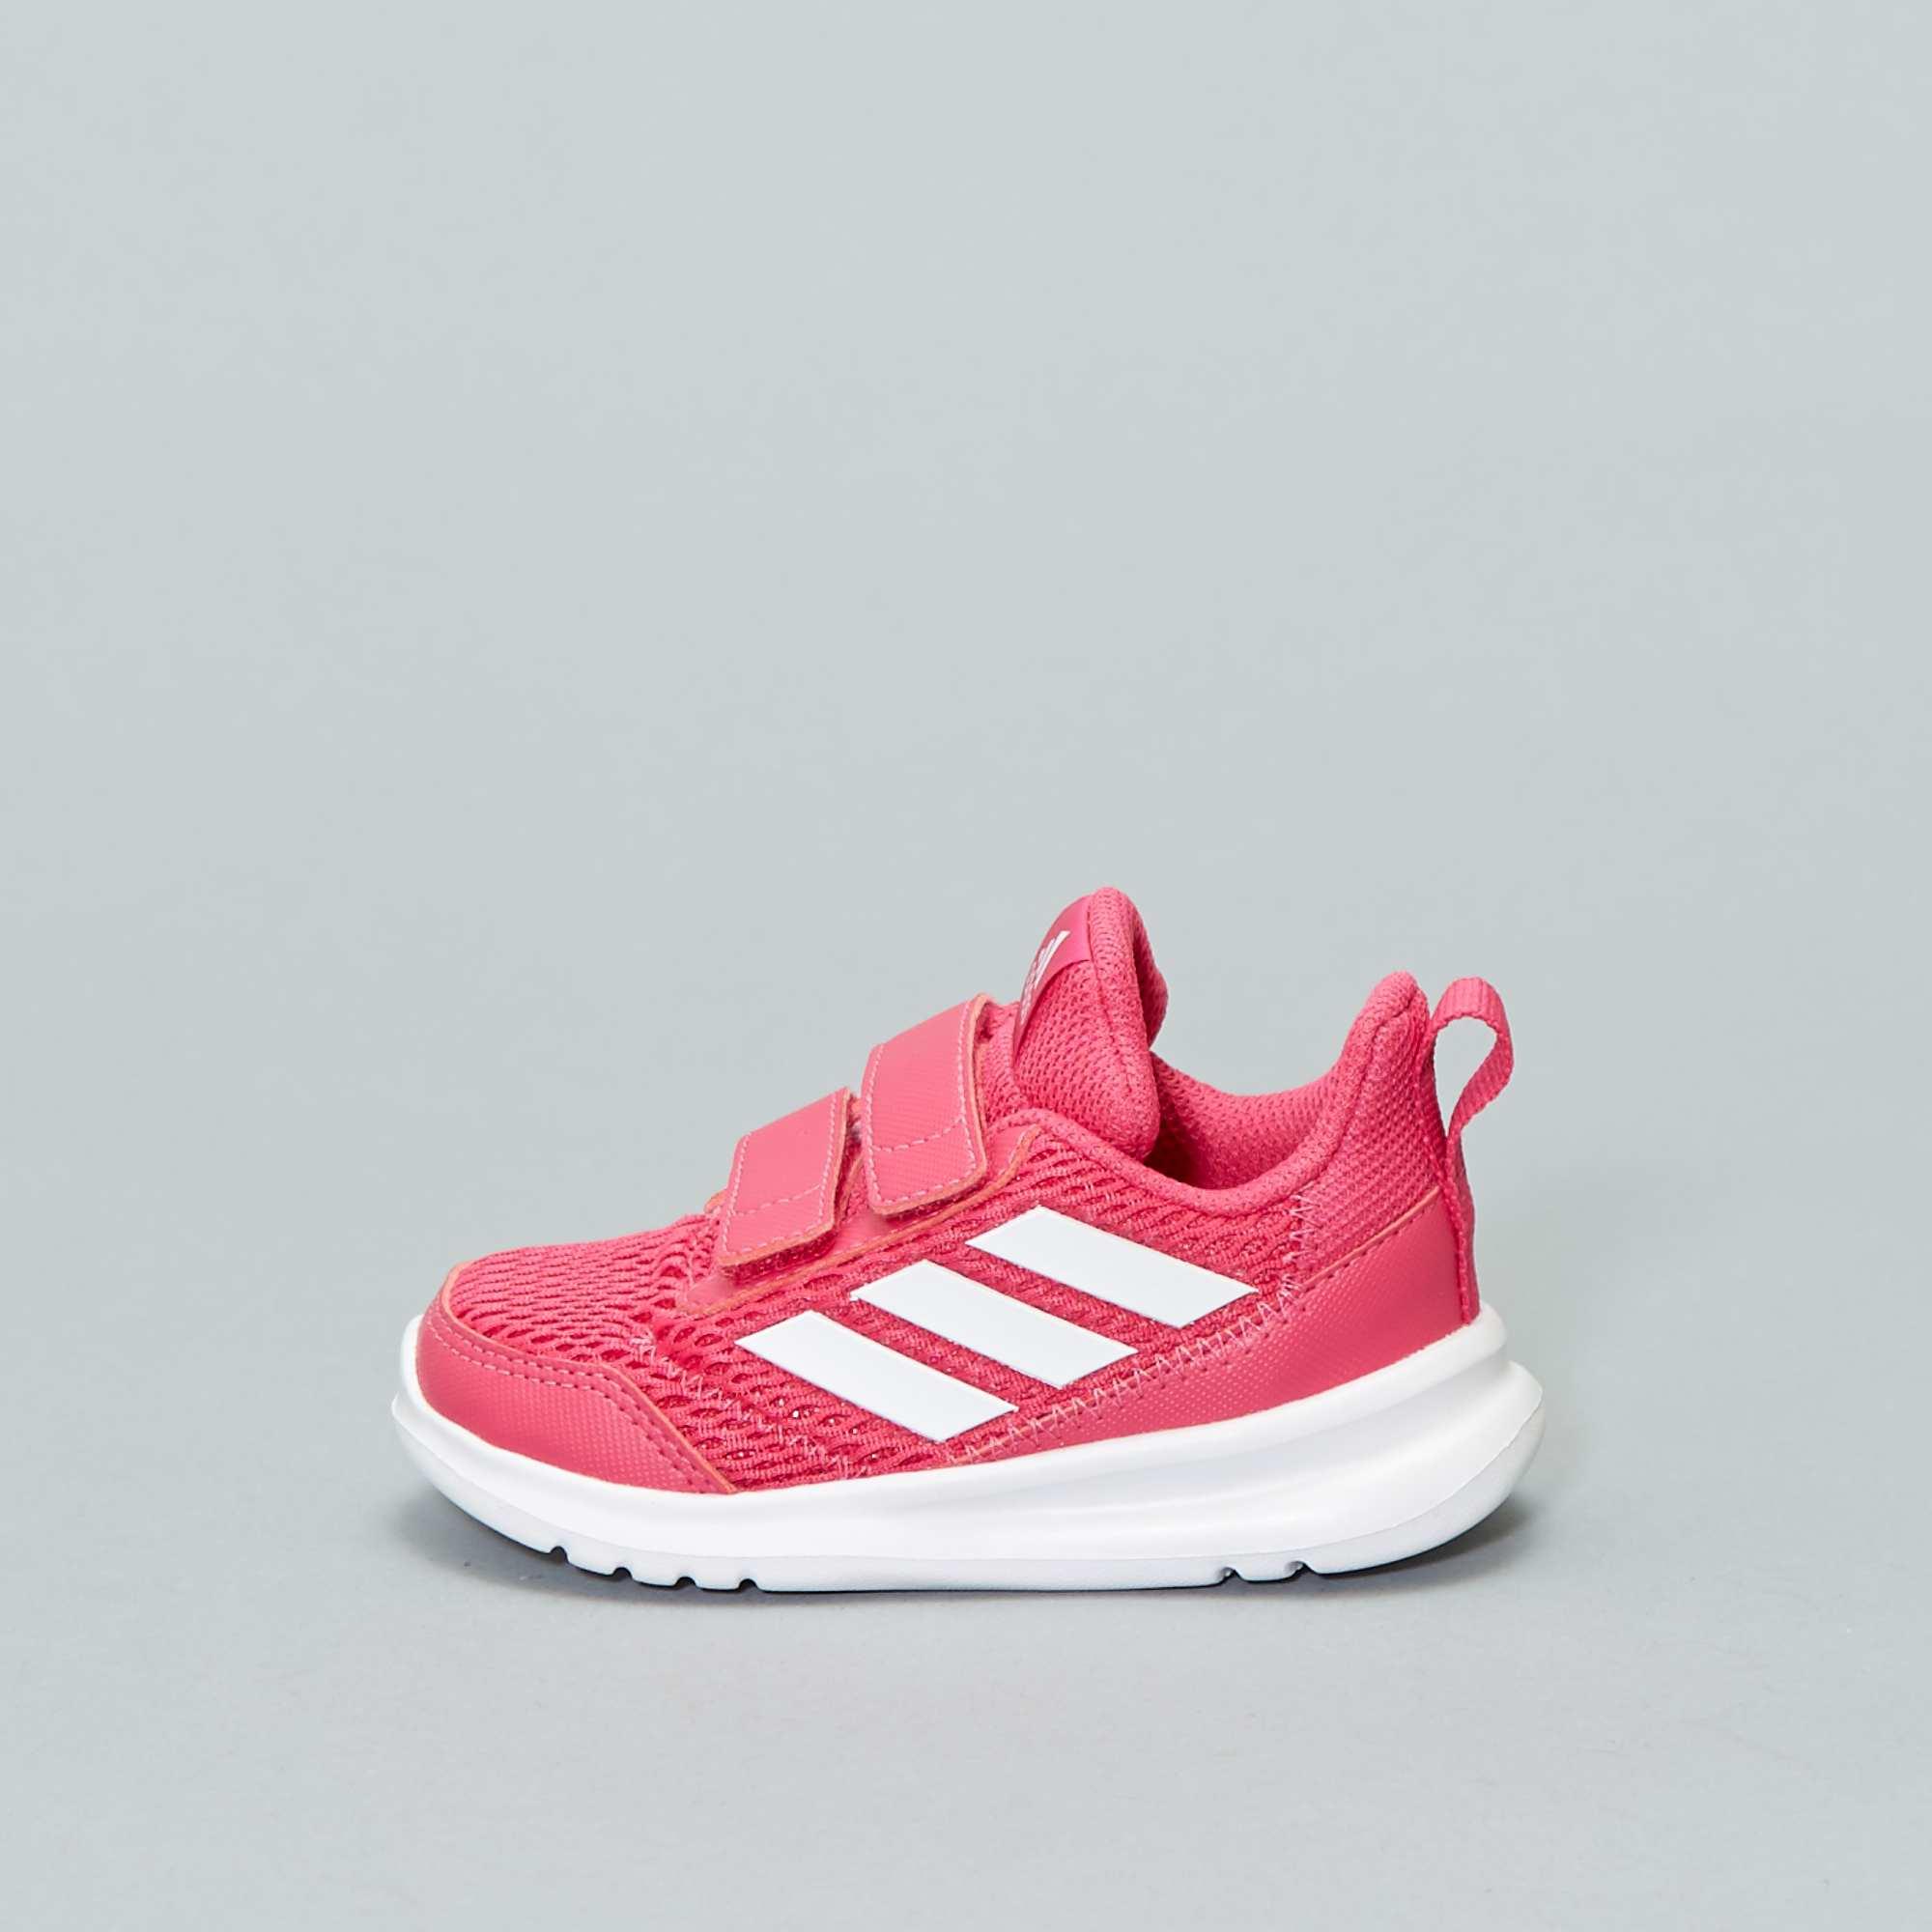 3a4a532572 Baskets basses 'adidas' Bébé fille - rose - Kiabi - 30,00€